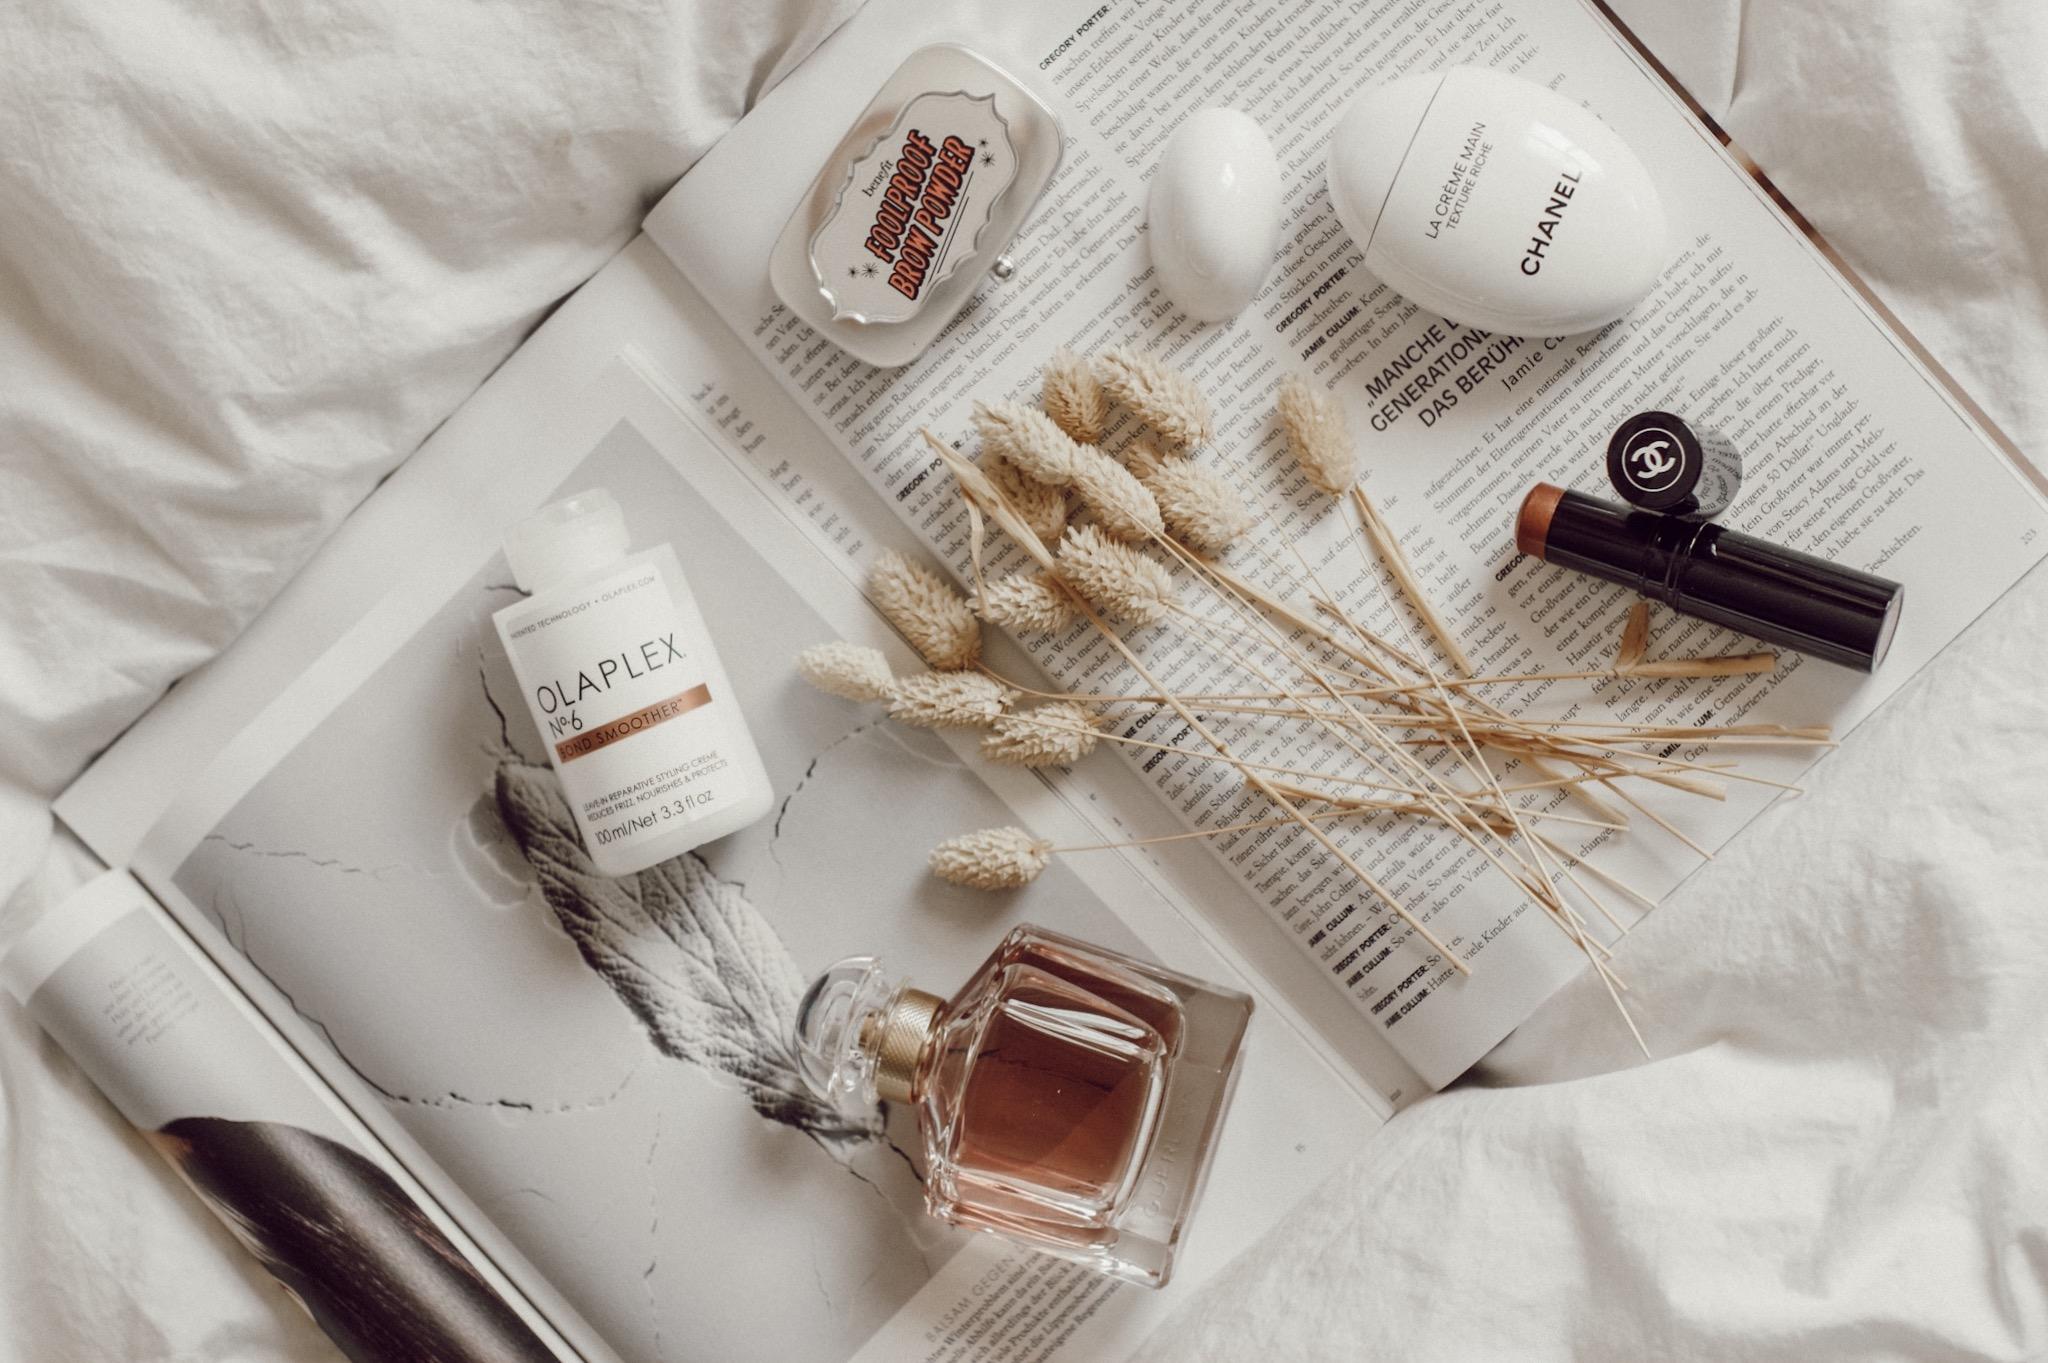 Beauty Favoriten, Mon Guerlain, Olaplex no 6, Chanel Handcreme, Foolproof brow